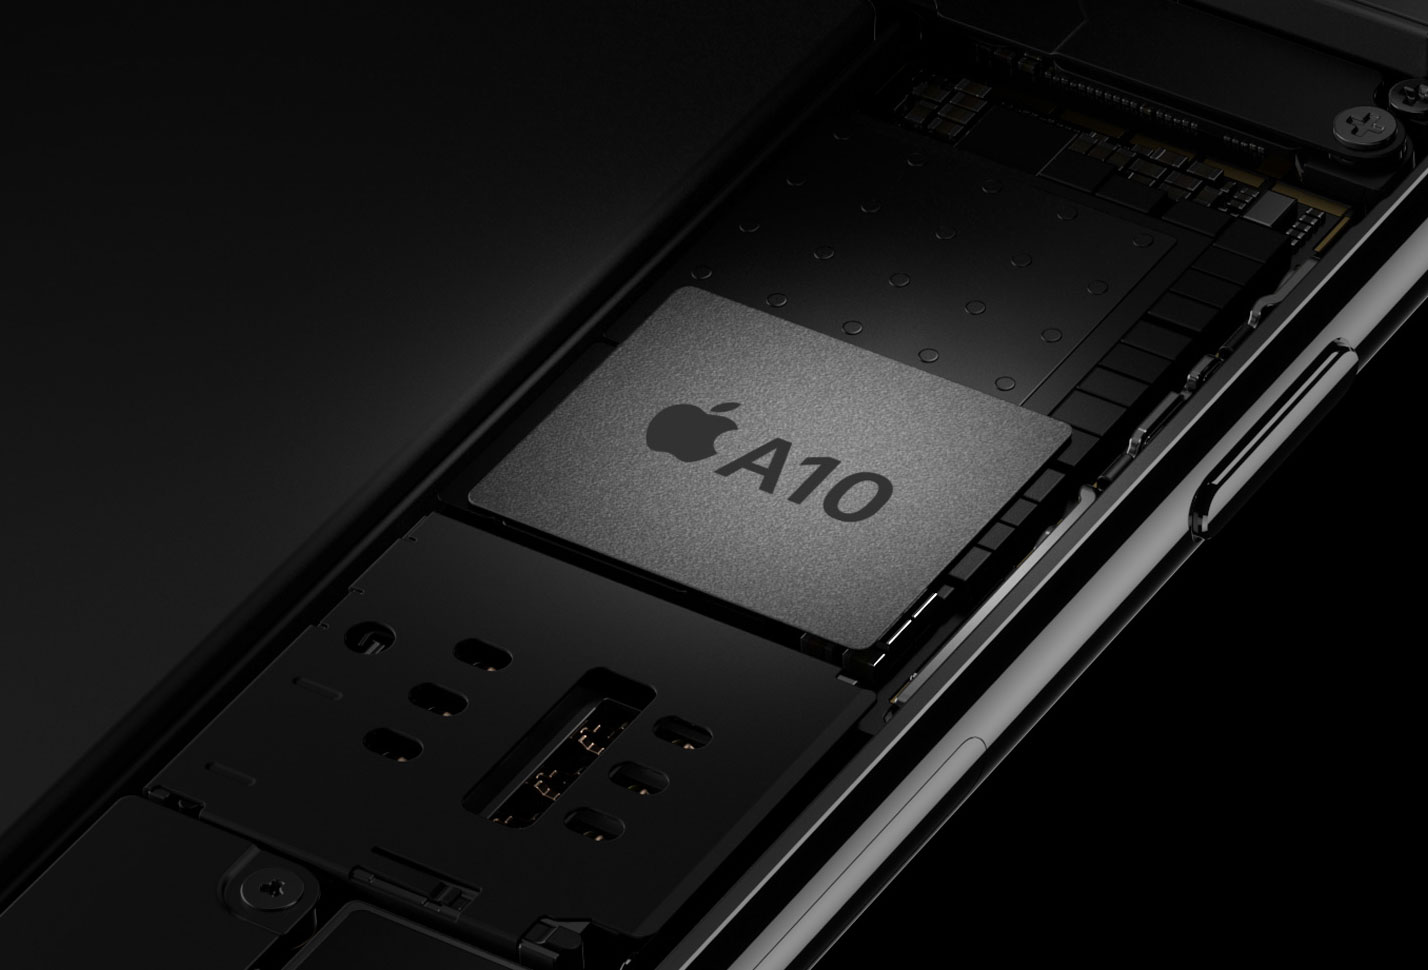 CPU A10